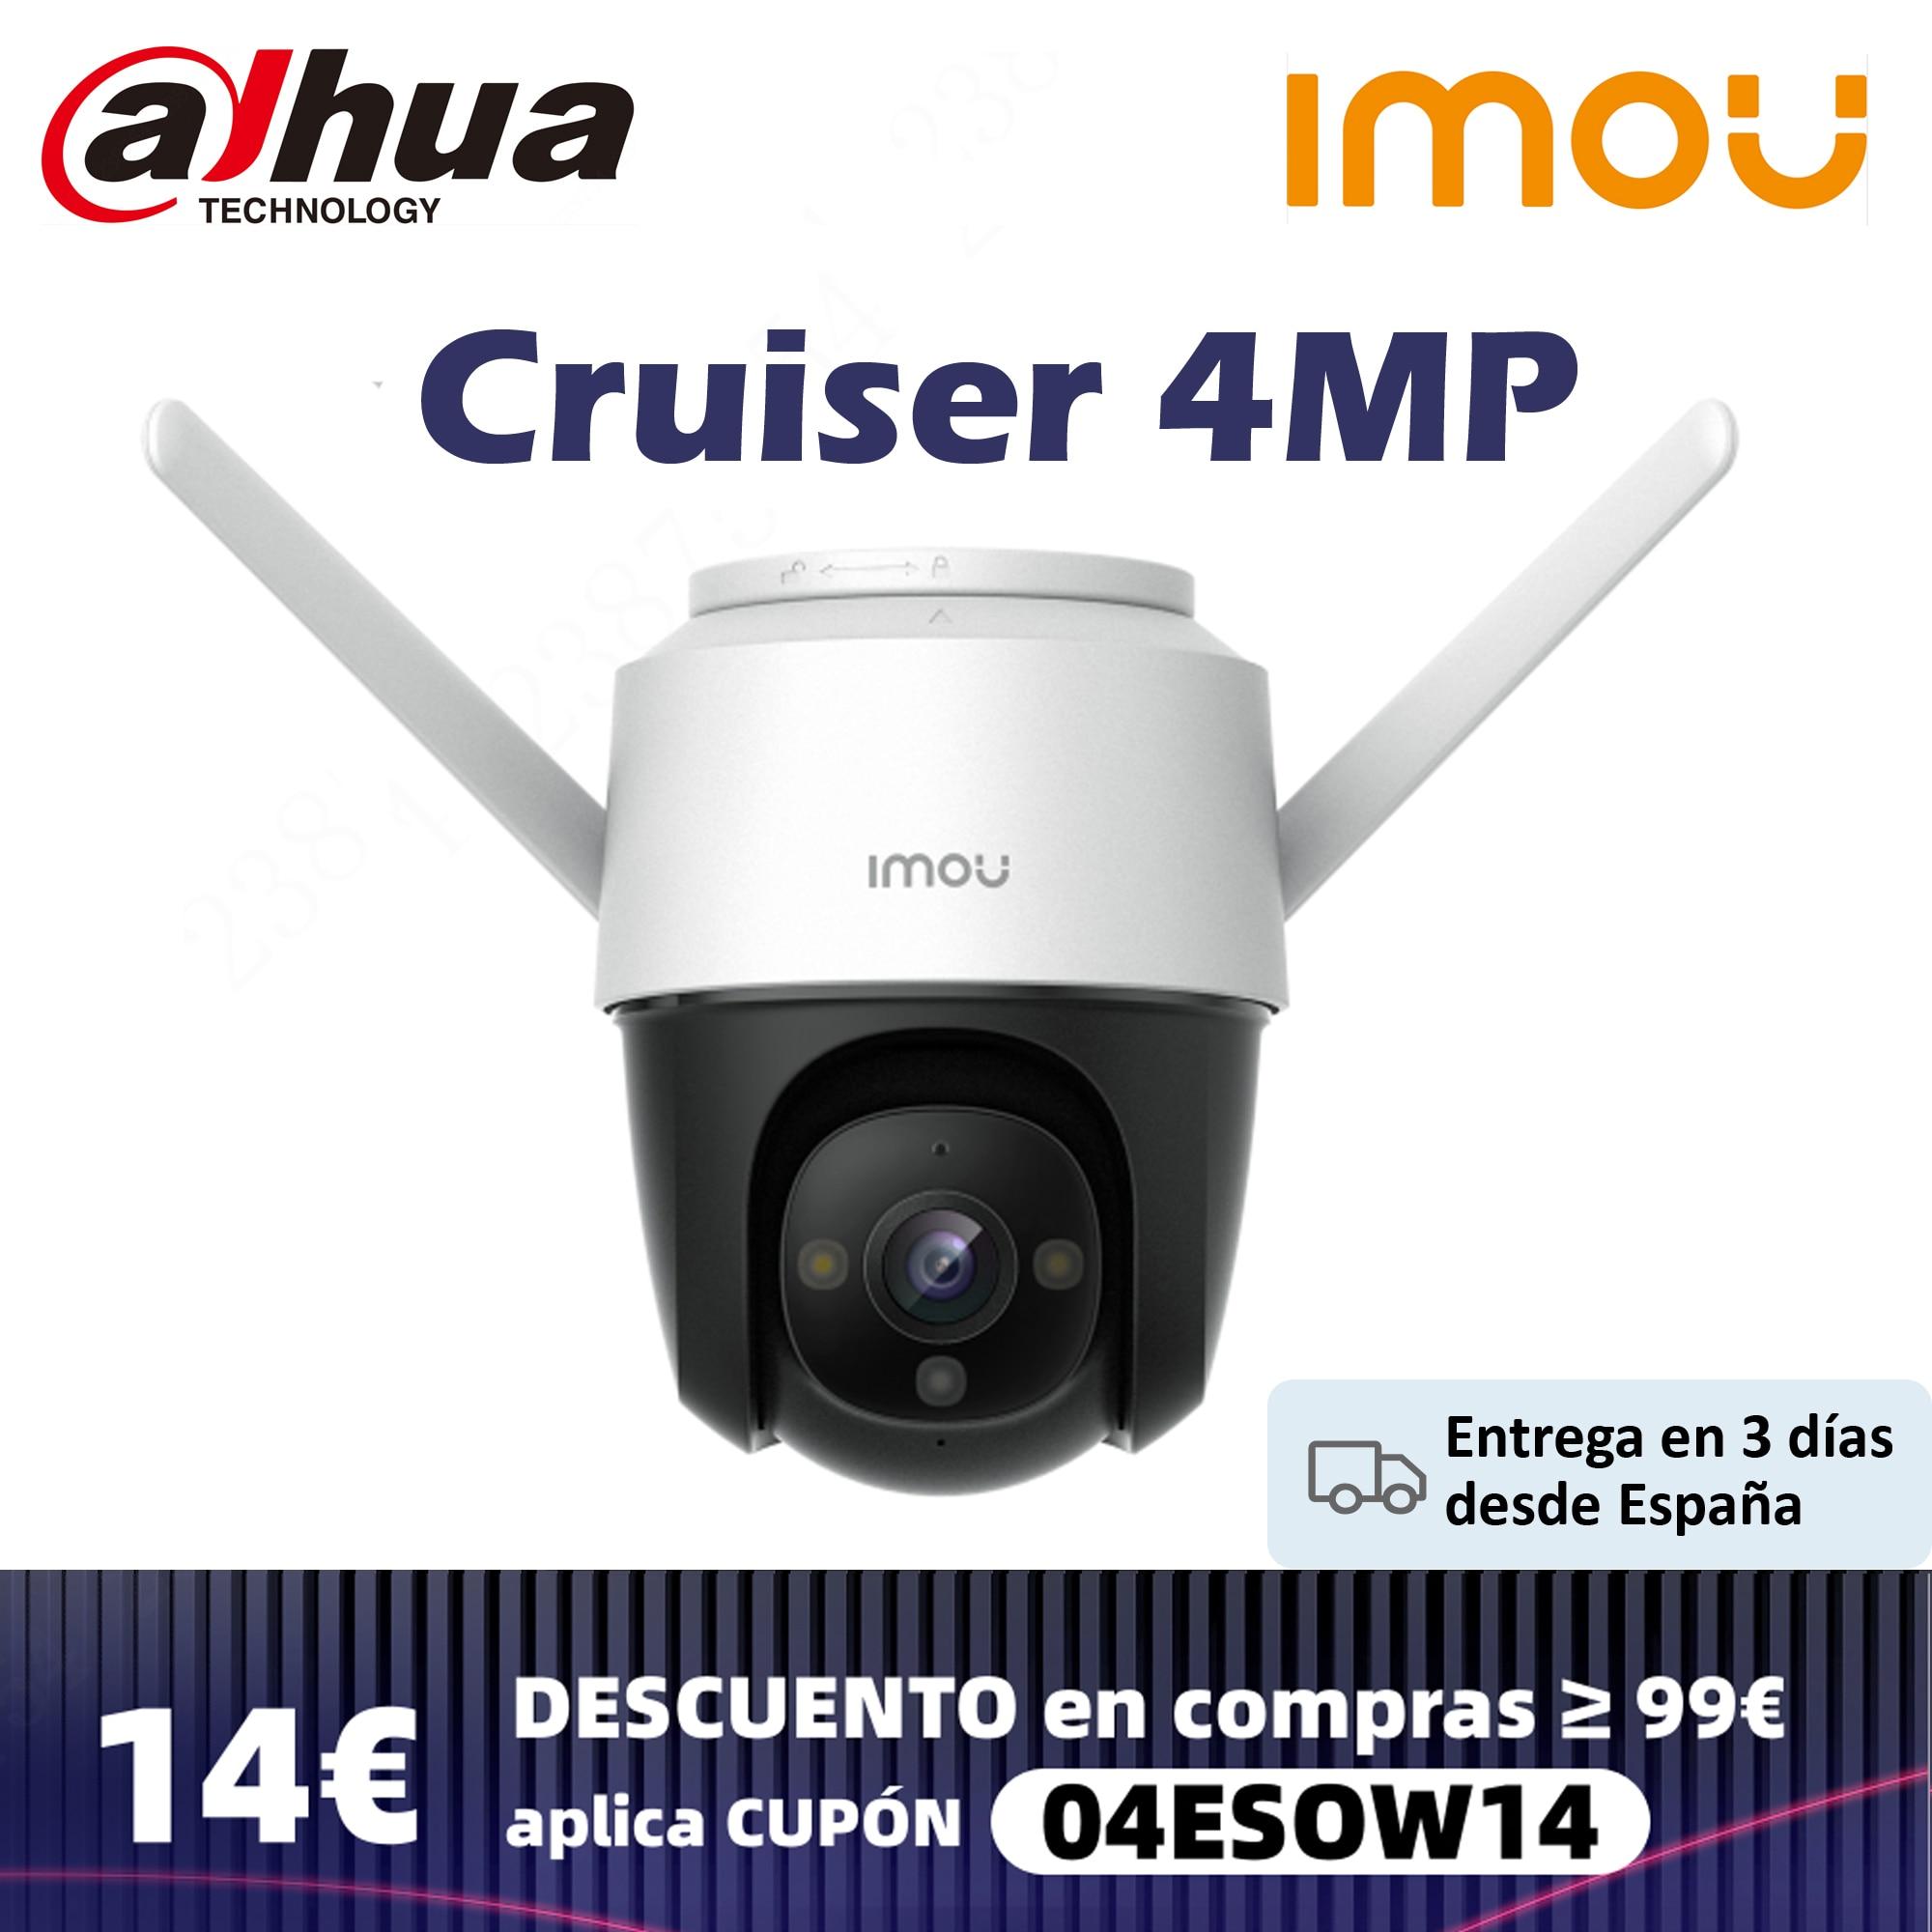 Dahua Imou Cruiser 4MP Full Color Wi-Fi Camera H.265 PTZ Outdoor IP66 Weatherproof Audio Record Nigh